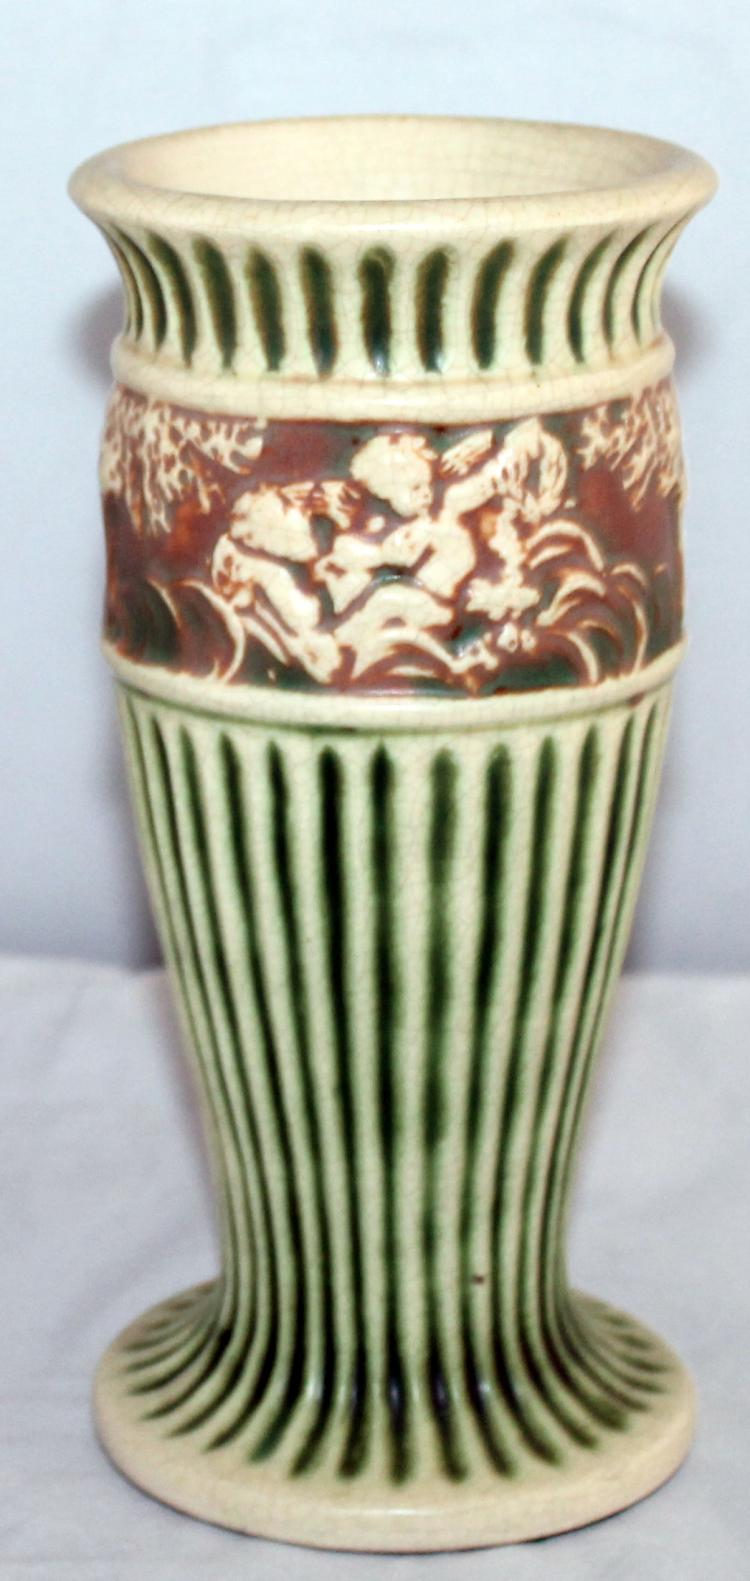 "Roseville Pottery Donatello Vase #104-8"" USA"